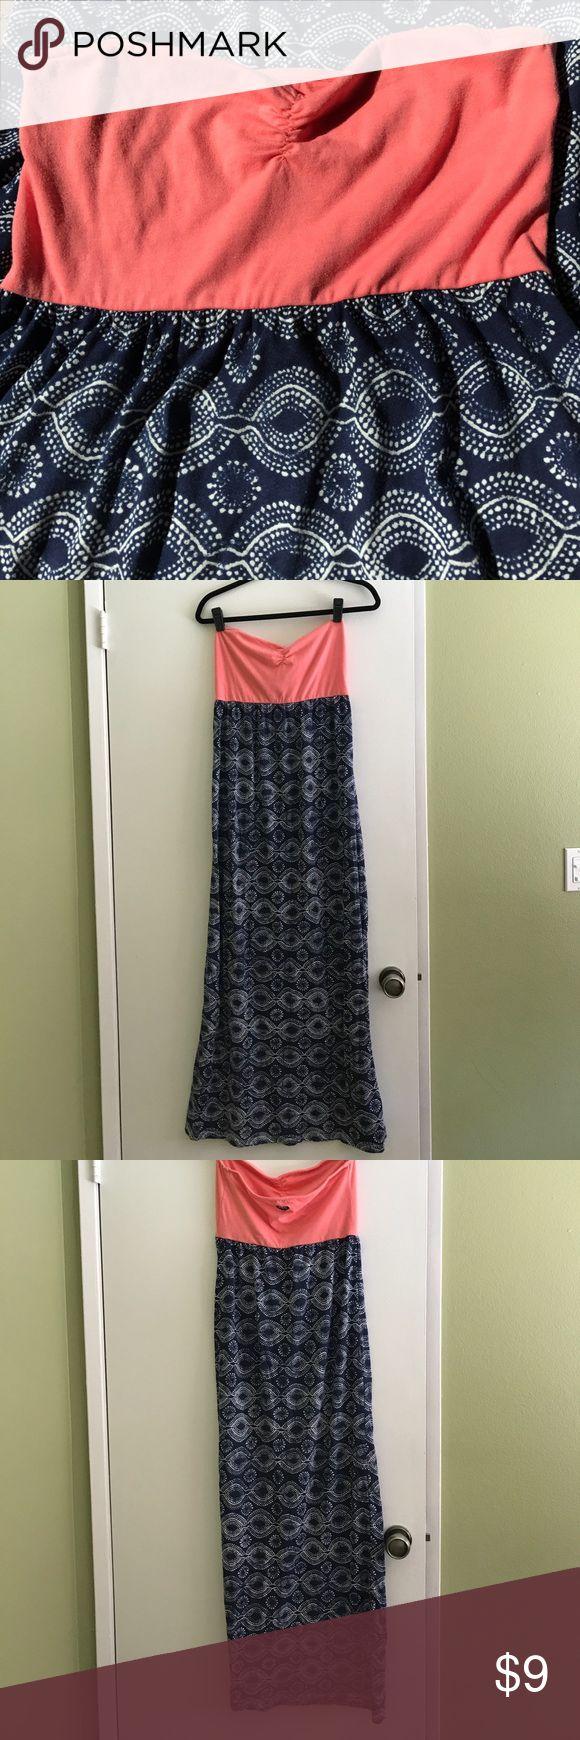 🌸 ROXY Strapless Maxi Dress ROXY pink & blue strapless maxi dress🌸 Roxy Dresses Maxi